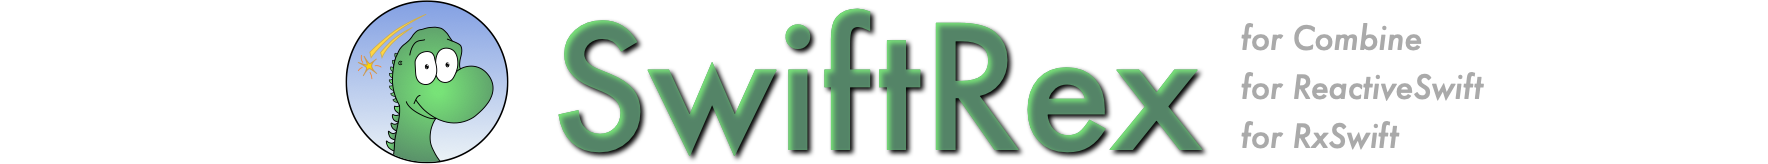 SwiftRex